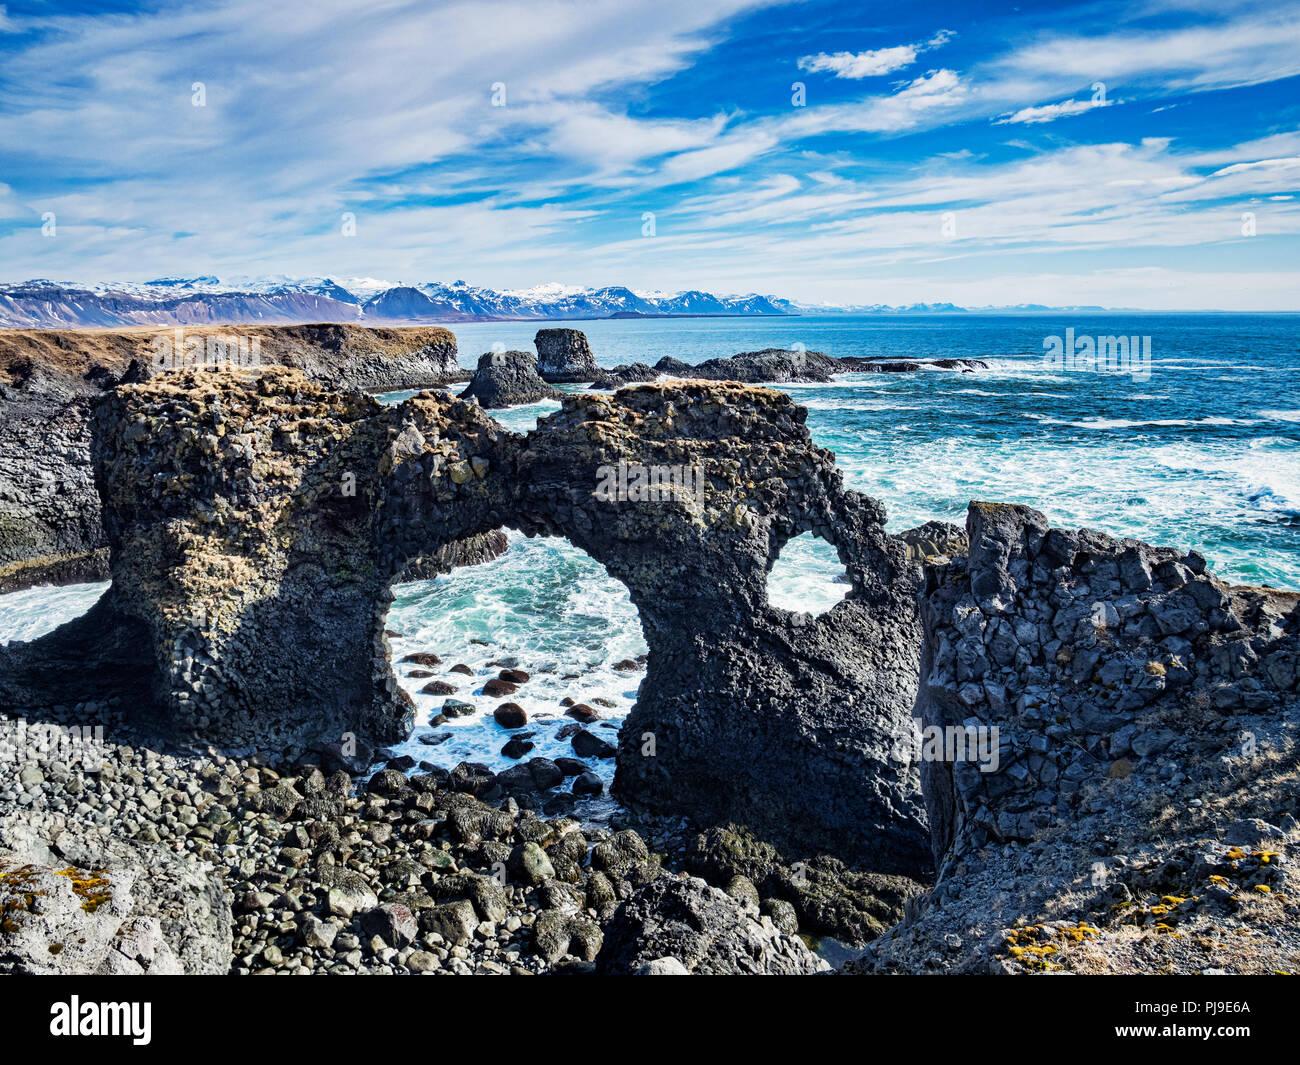 Gatklettur Arch Rock at Hellnar, near Arnarstapi on the Snaefellsnes Peninsula in western Iceland. - Stock Image